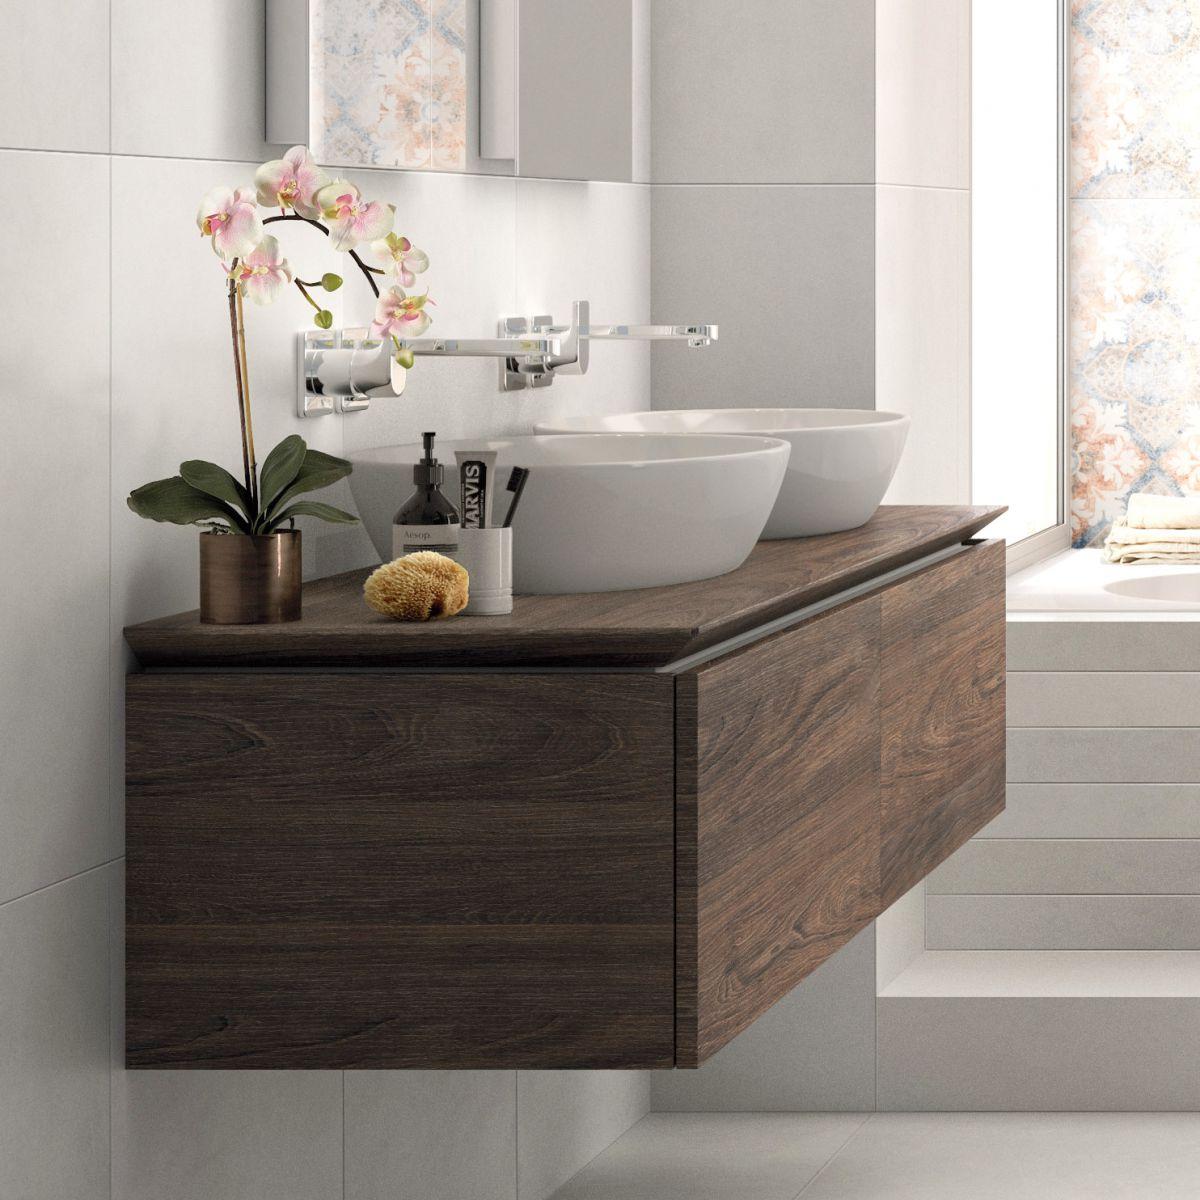 Outstanding Villeroy Boch Legato Uk Bathrooms Download Free Architecture Designs Intelgarnamadebymaigaardcom